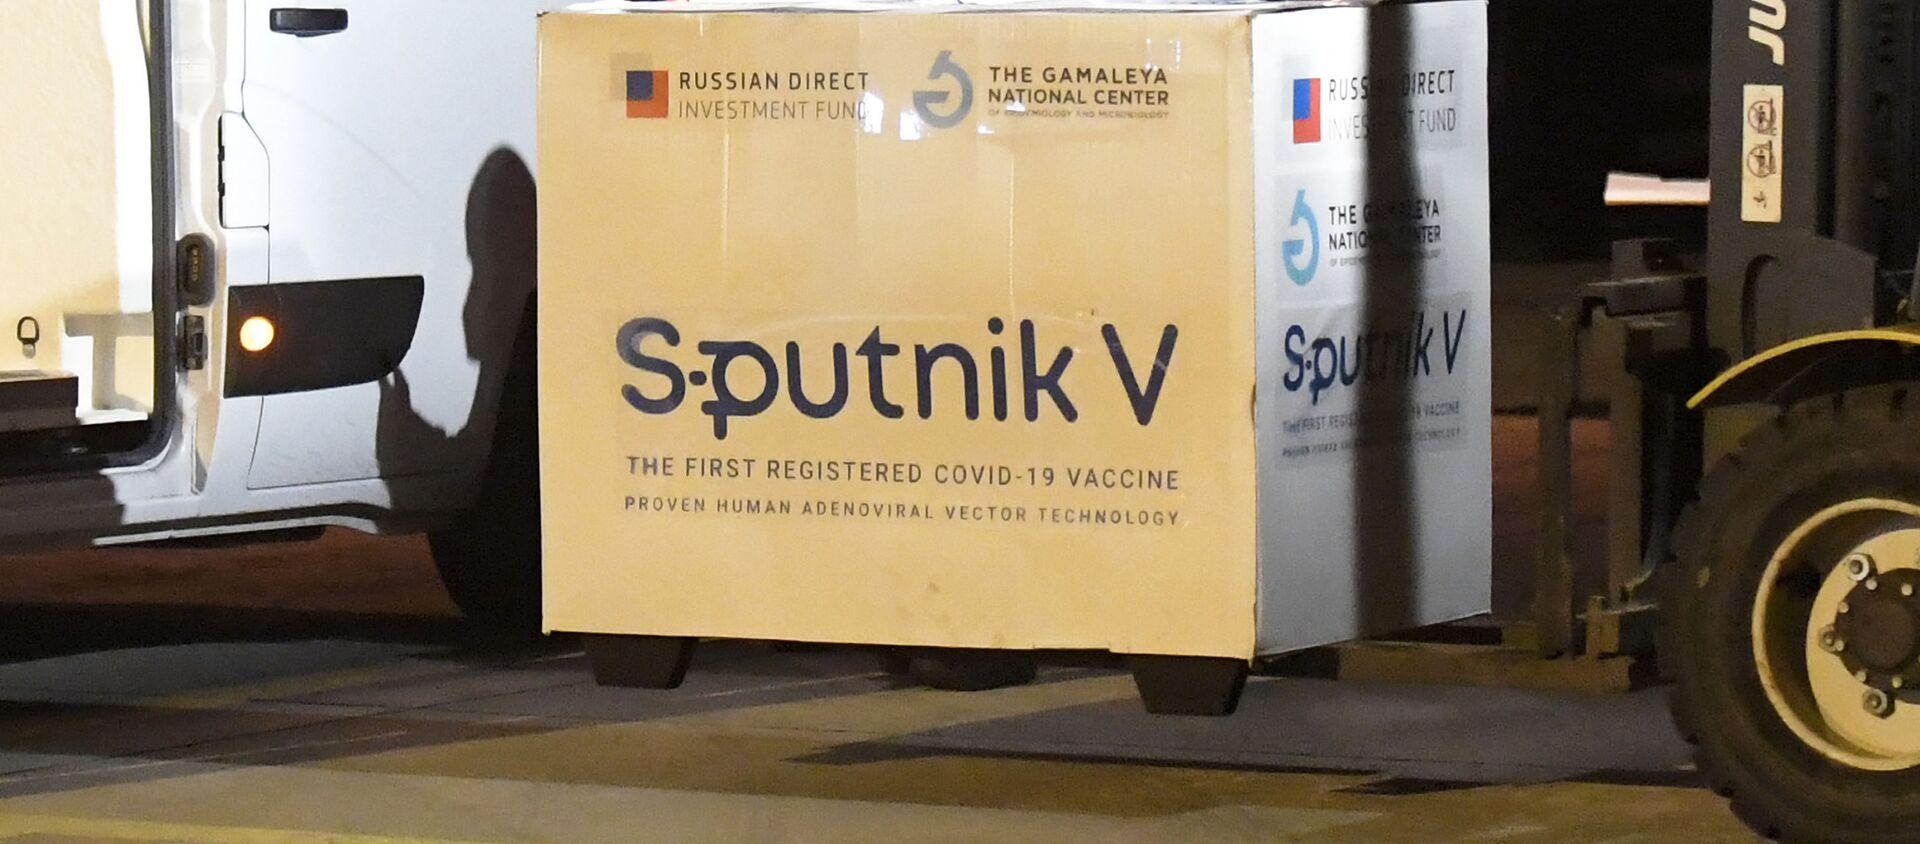 Вакцина Sputnik V, фото из архива - Sputnik Азербайджан, 1920, 12.03.2021